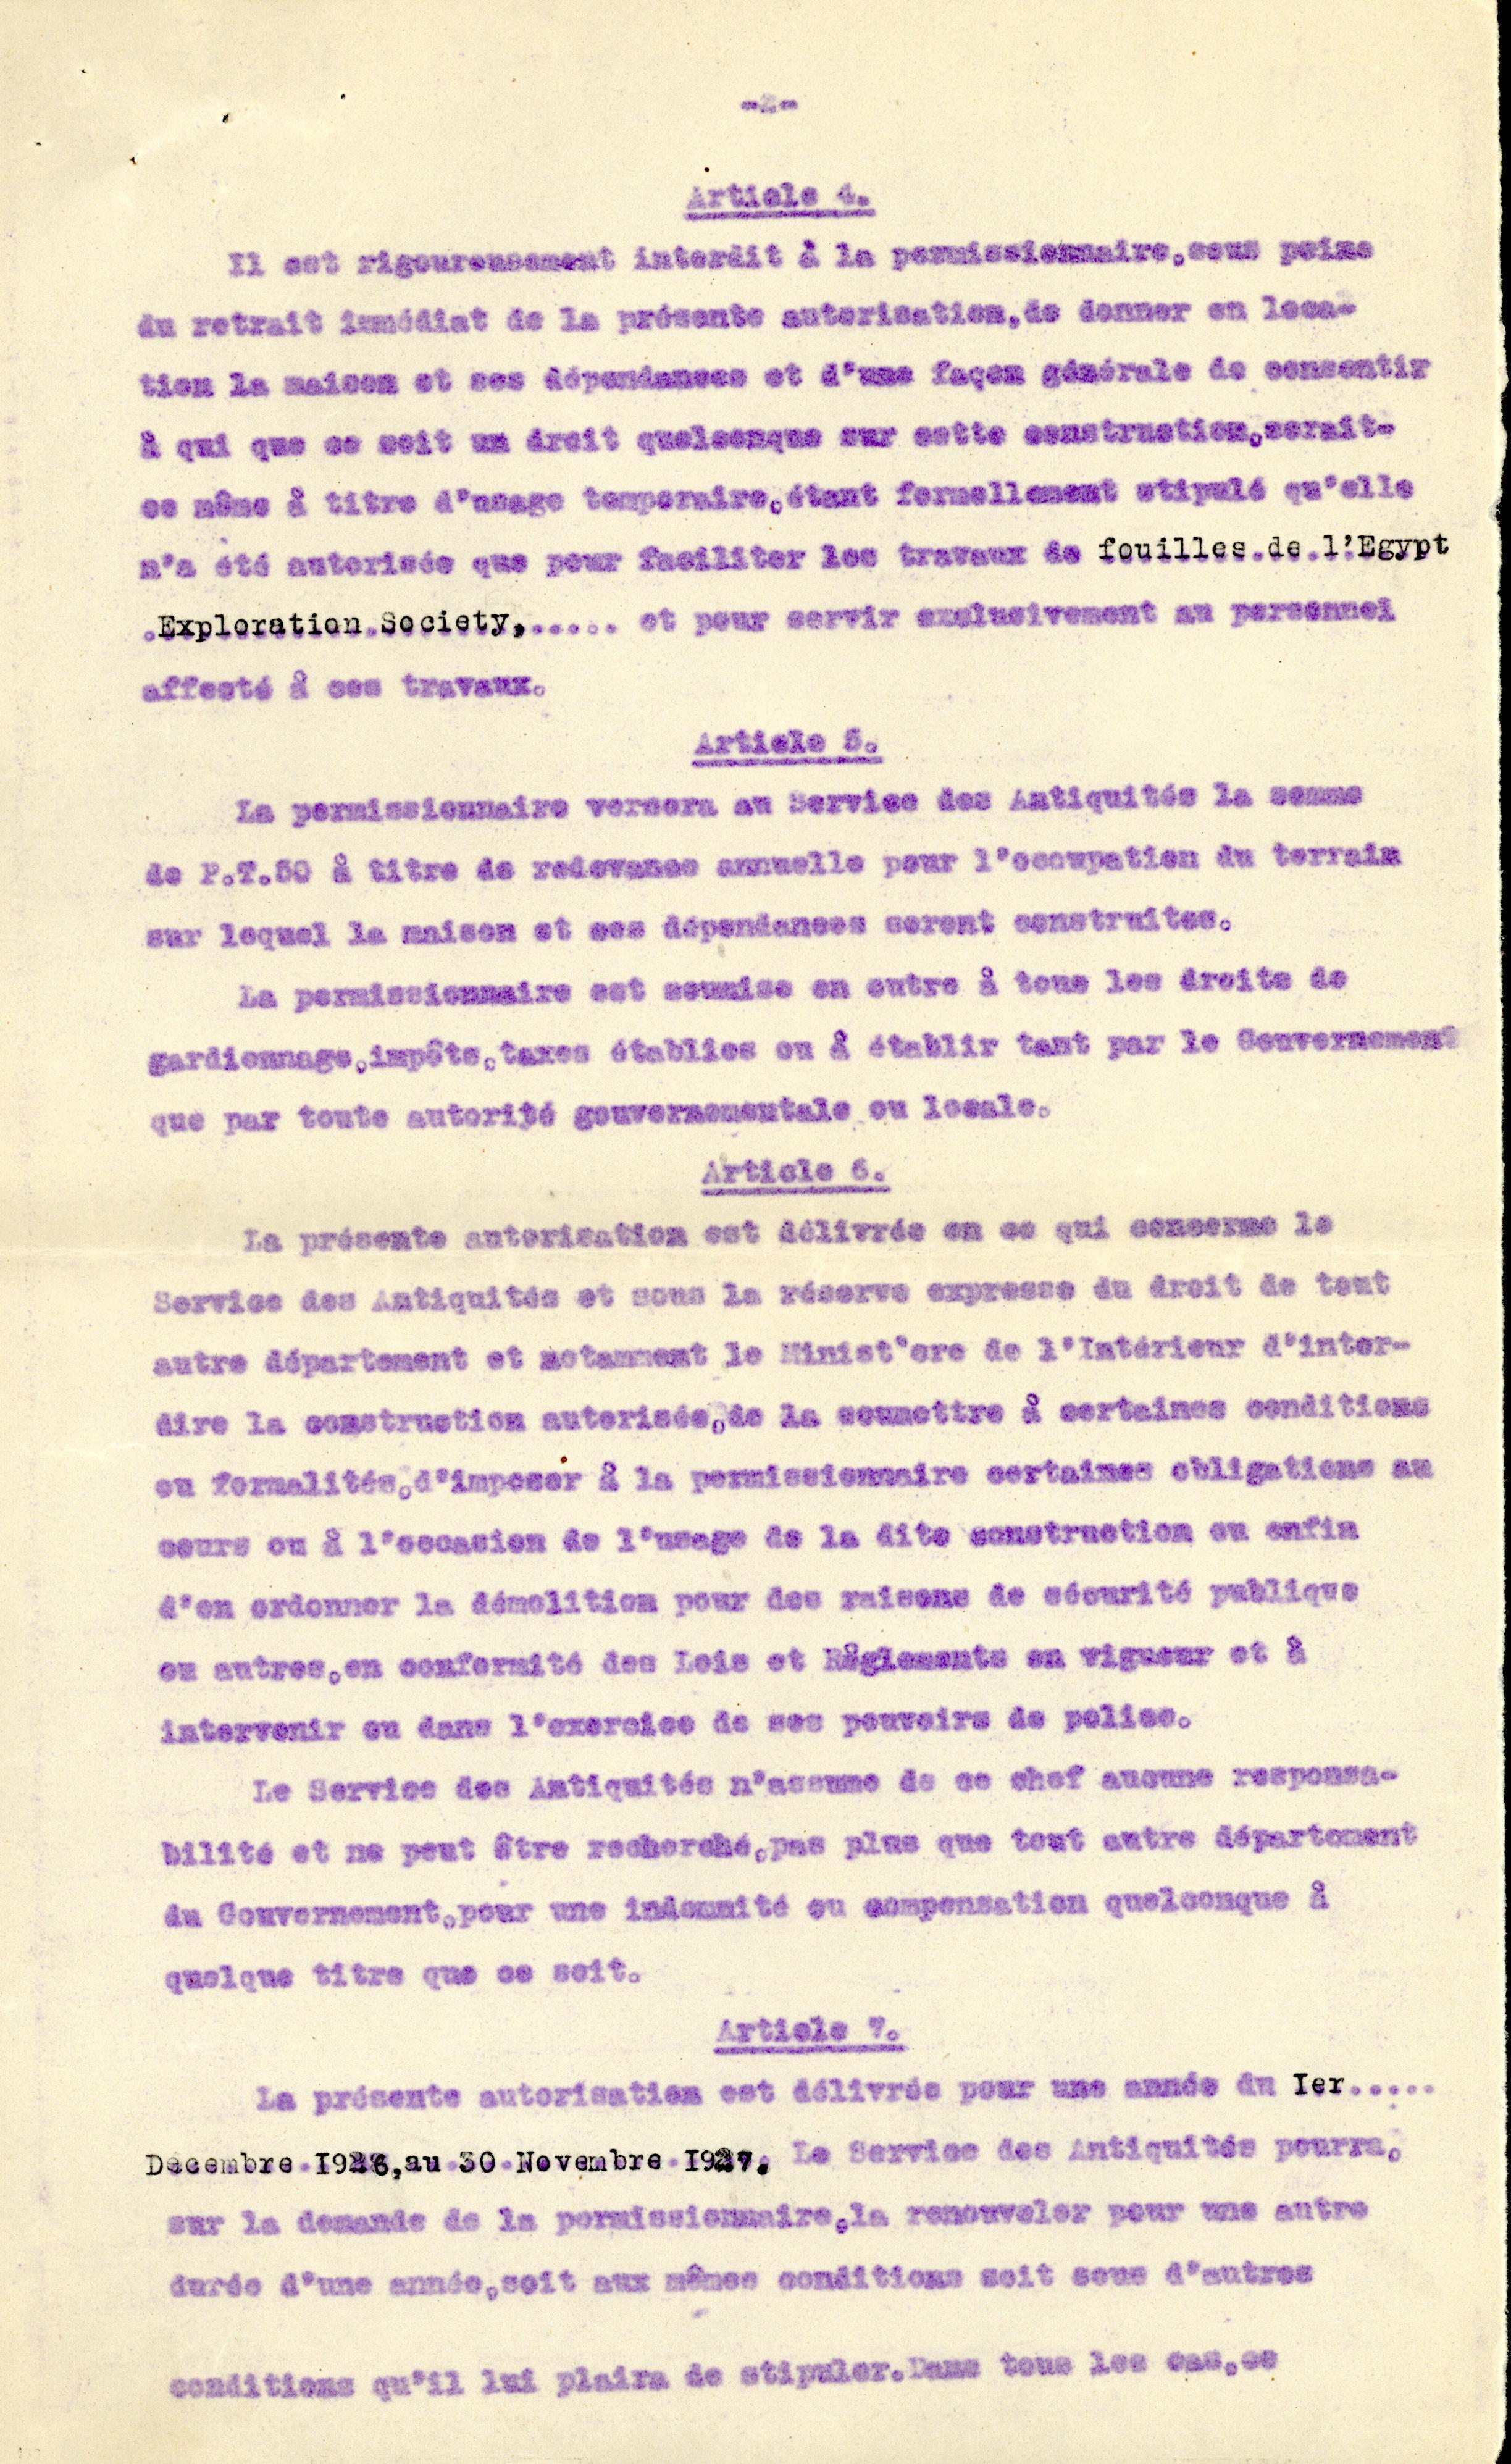 1926-39 correspondence with Antiquities Service DIST.50.11b